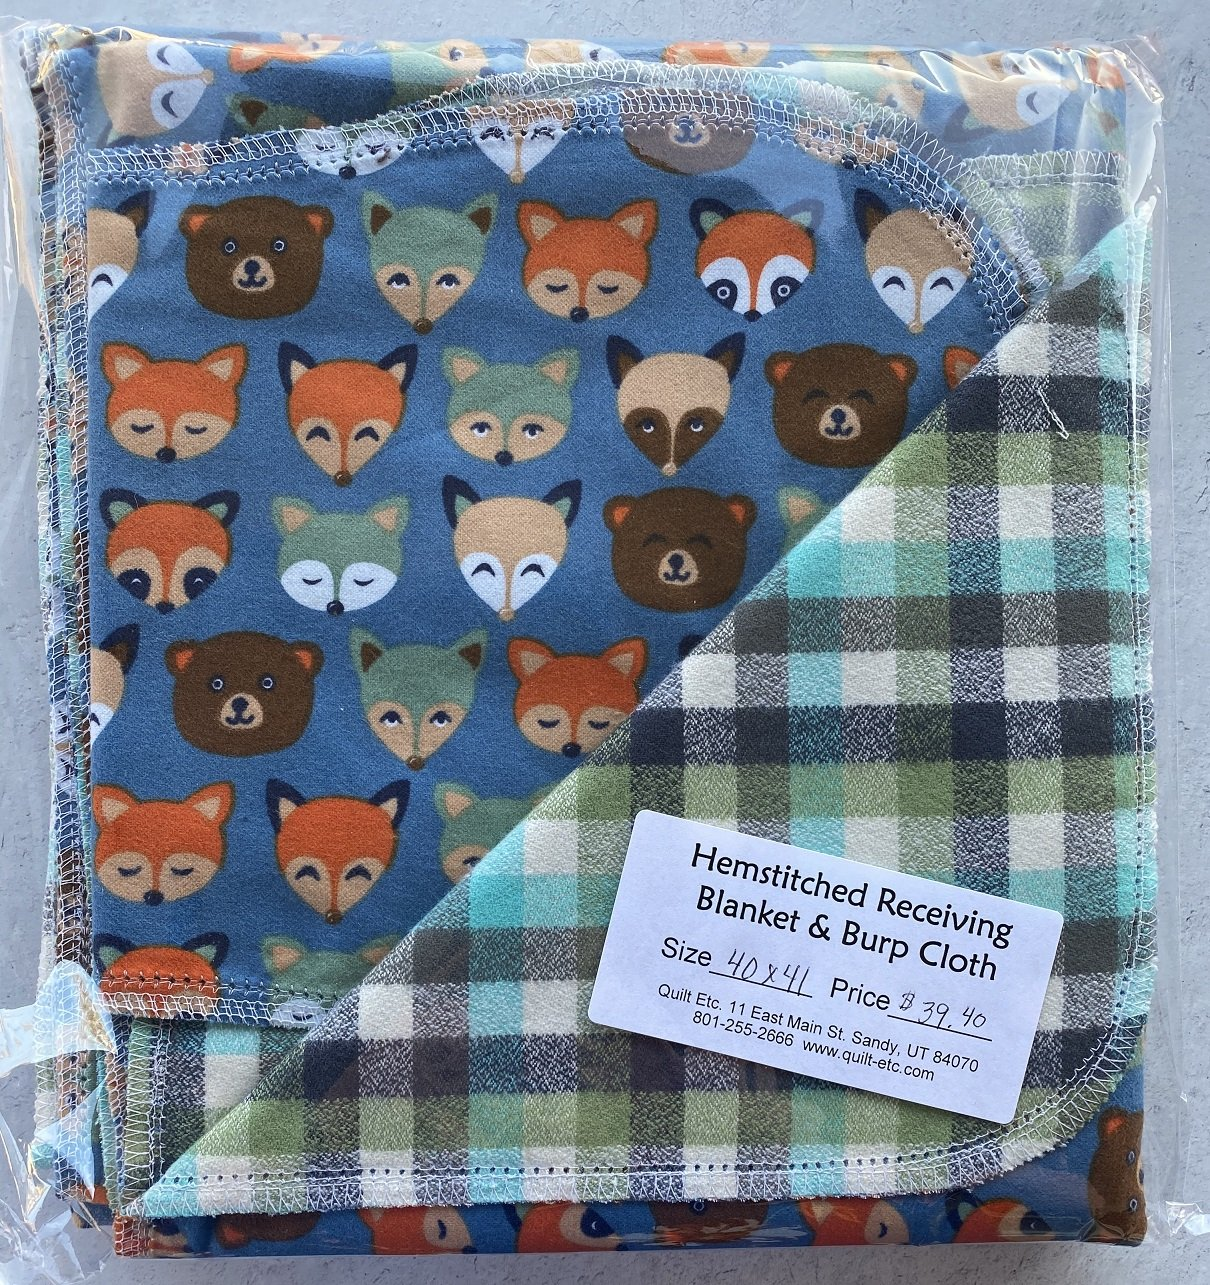 Hemstitched Receiving Blanket & Burp Cloth 5